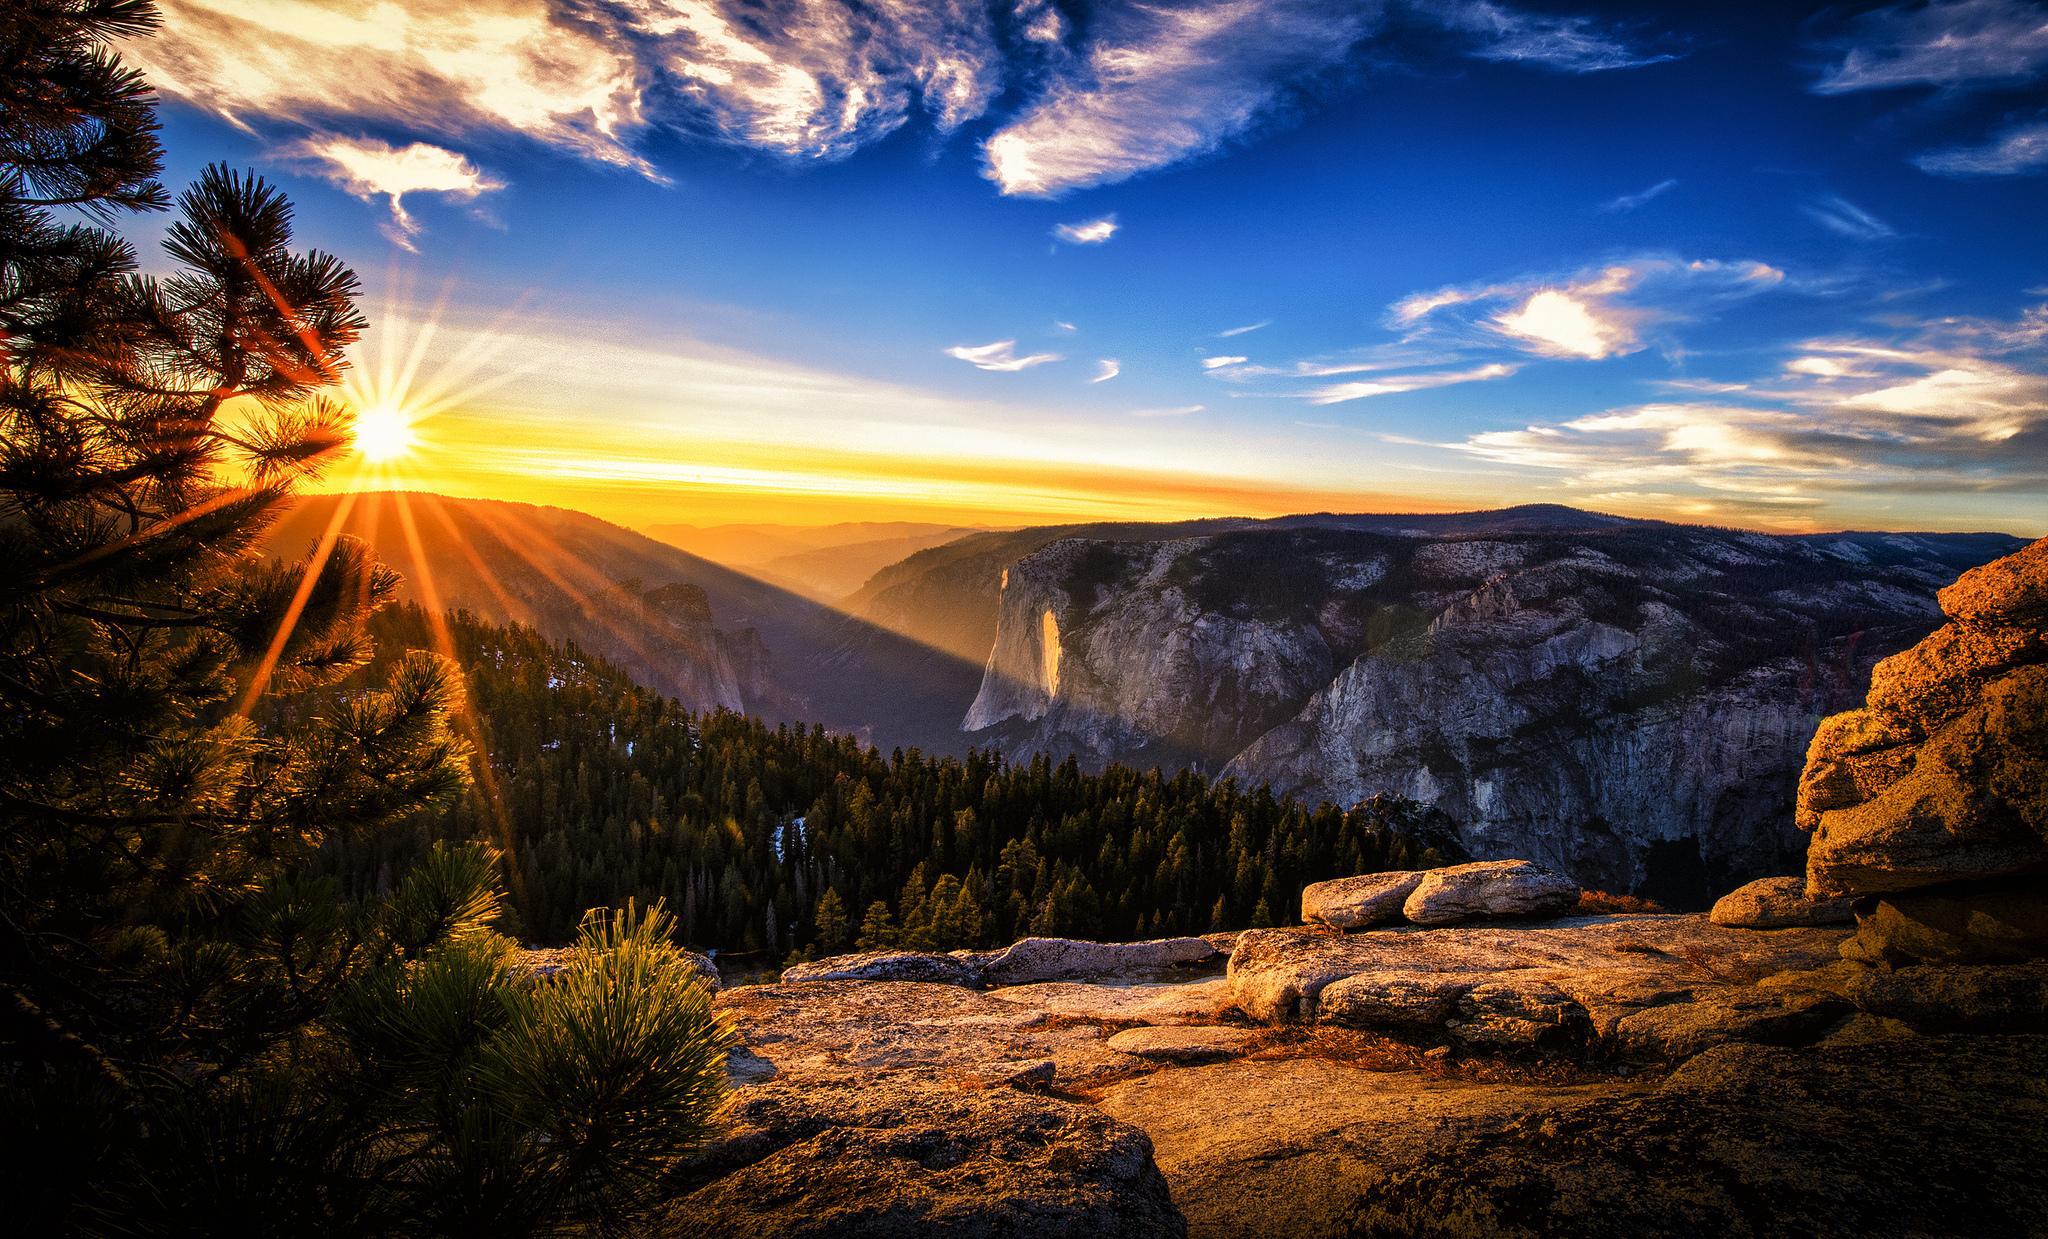 Wallpaper usa california yosemite national park yosemite national 2048x1239